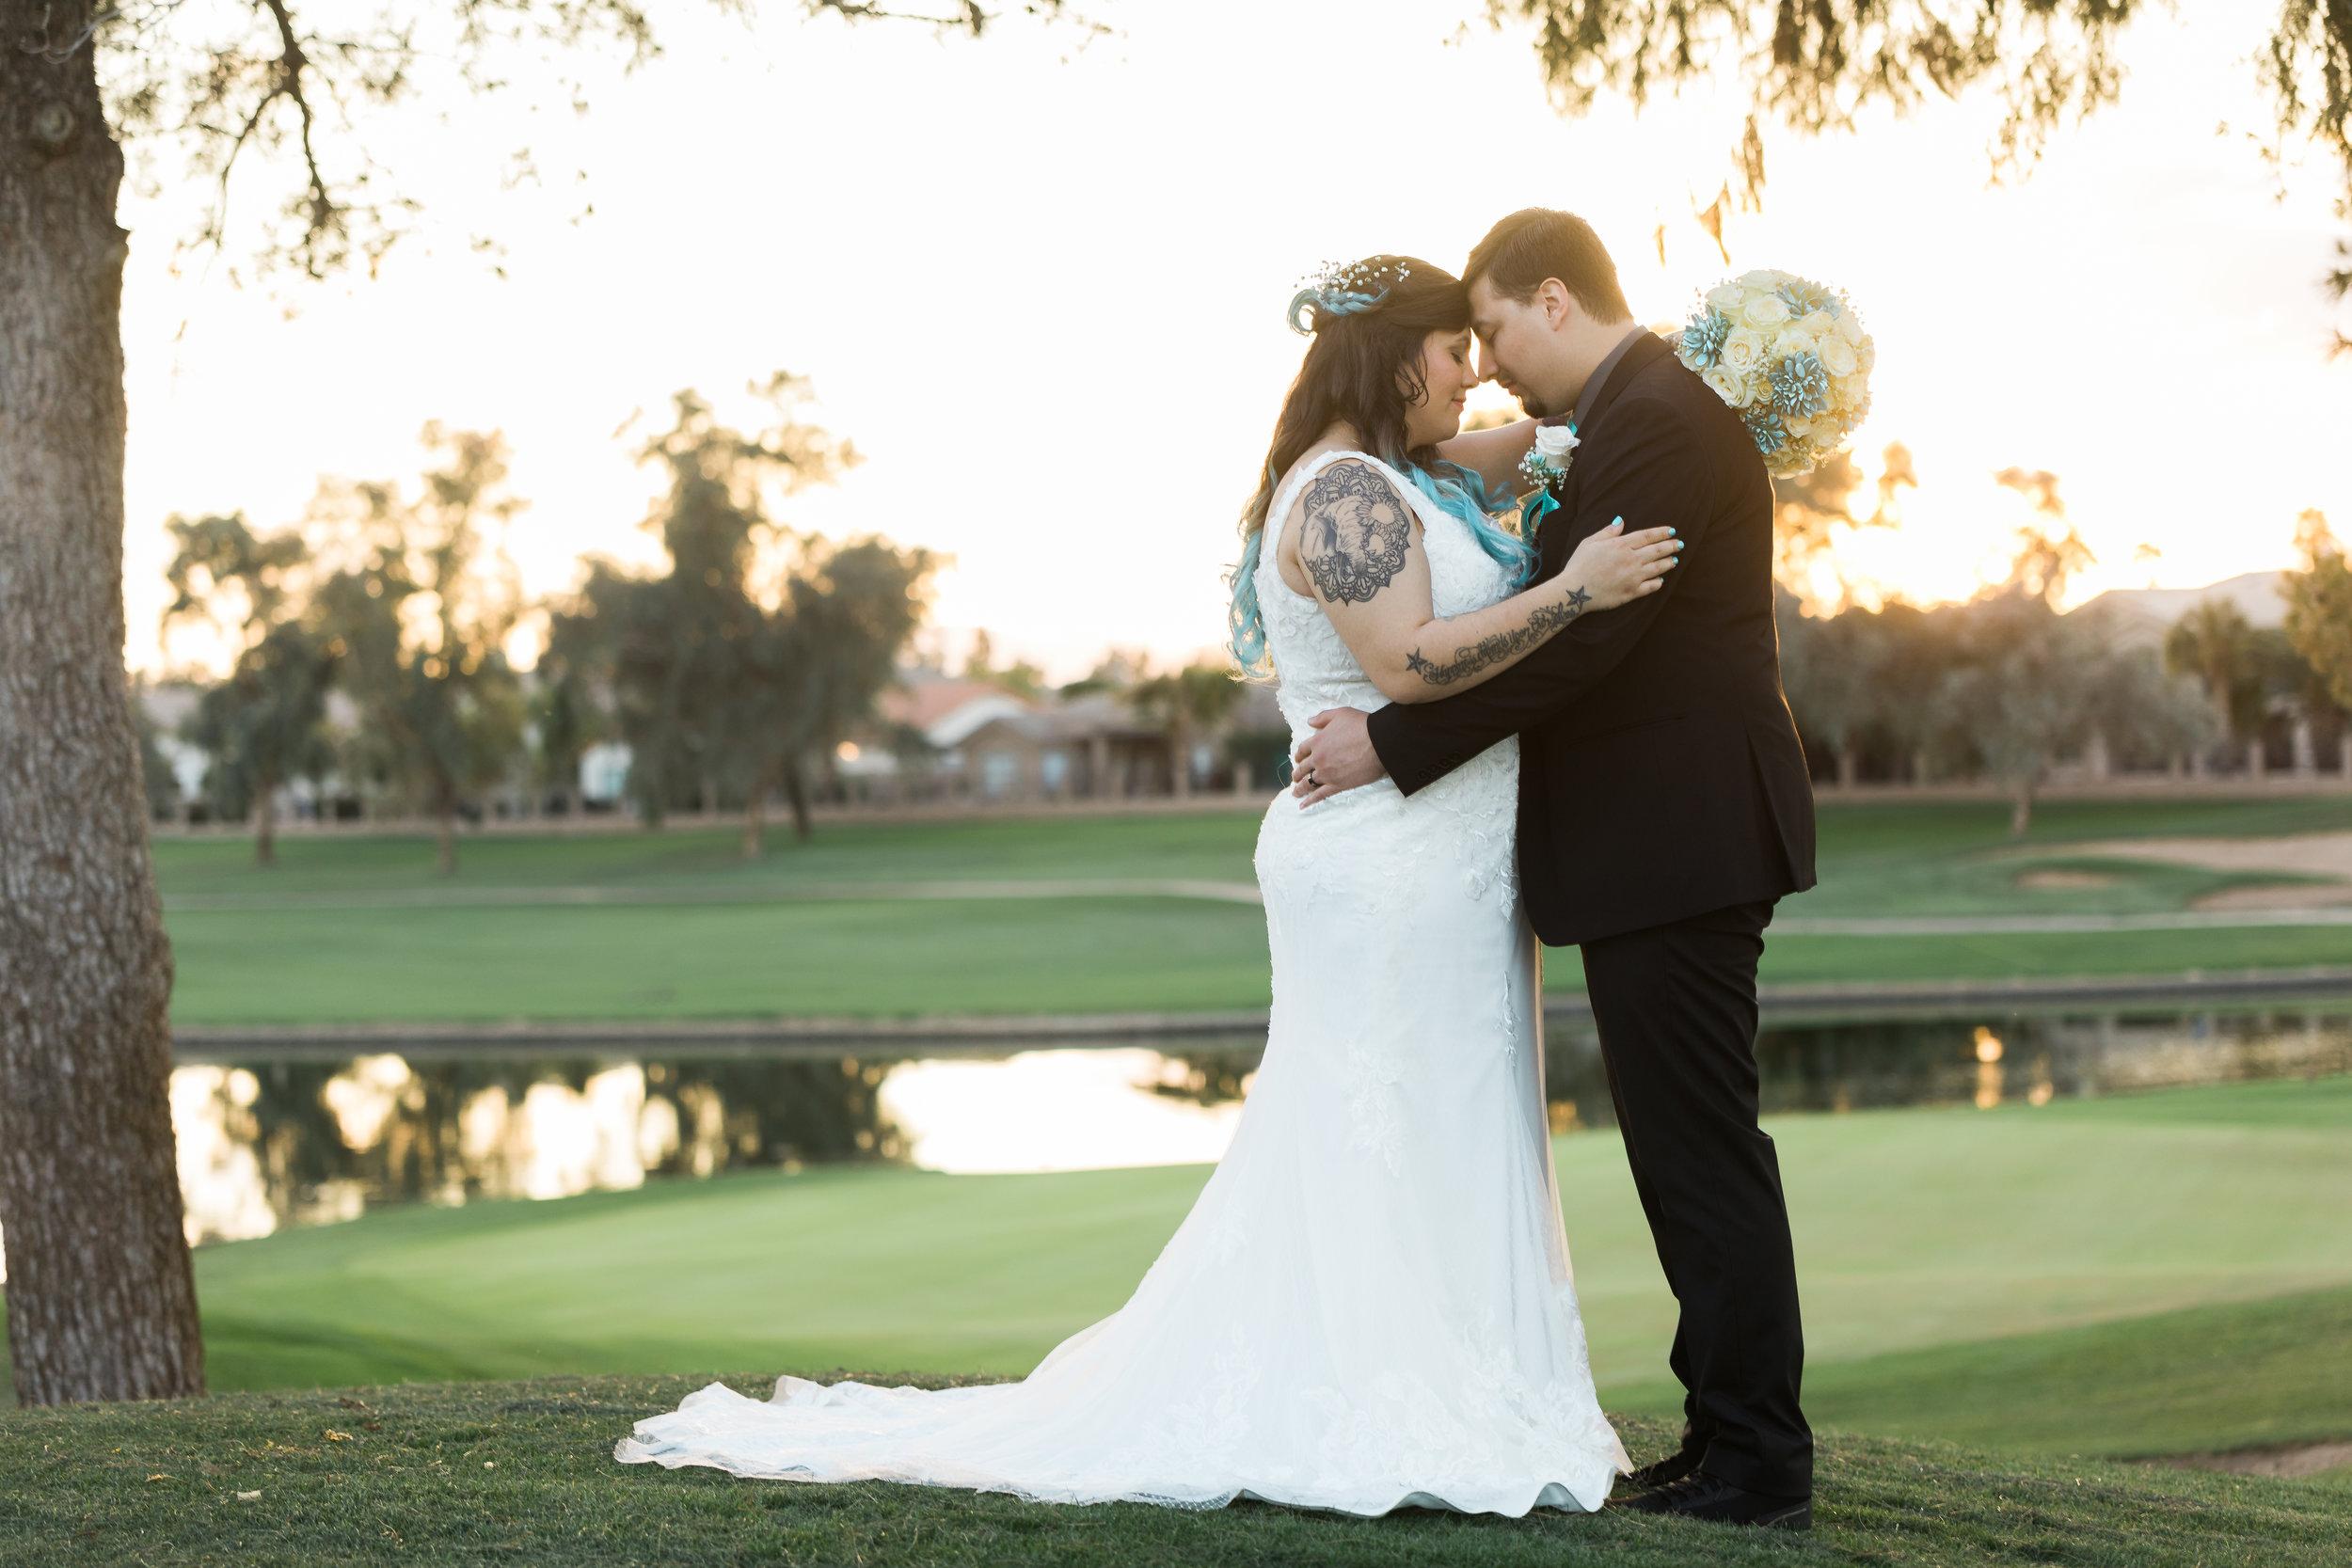 Carlos-Kayla-Wedding-Tara-Nichole-Photo-Wedgewood-Chandler-Arizona-446.jpg